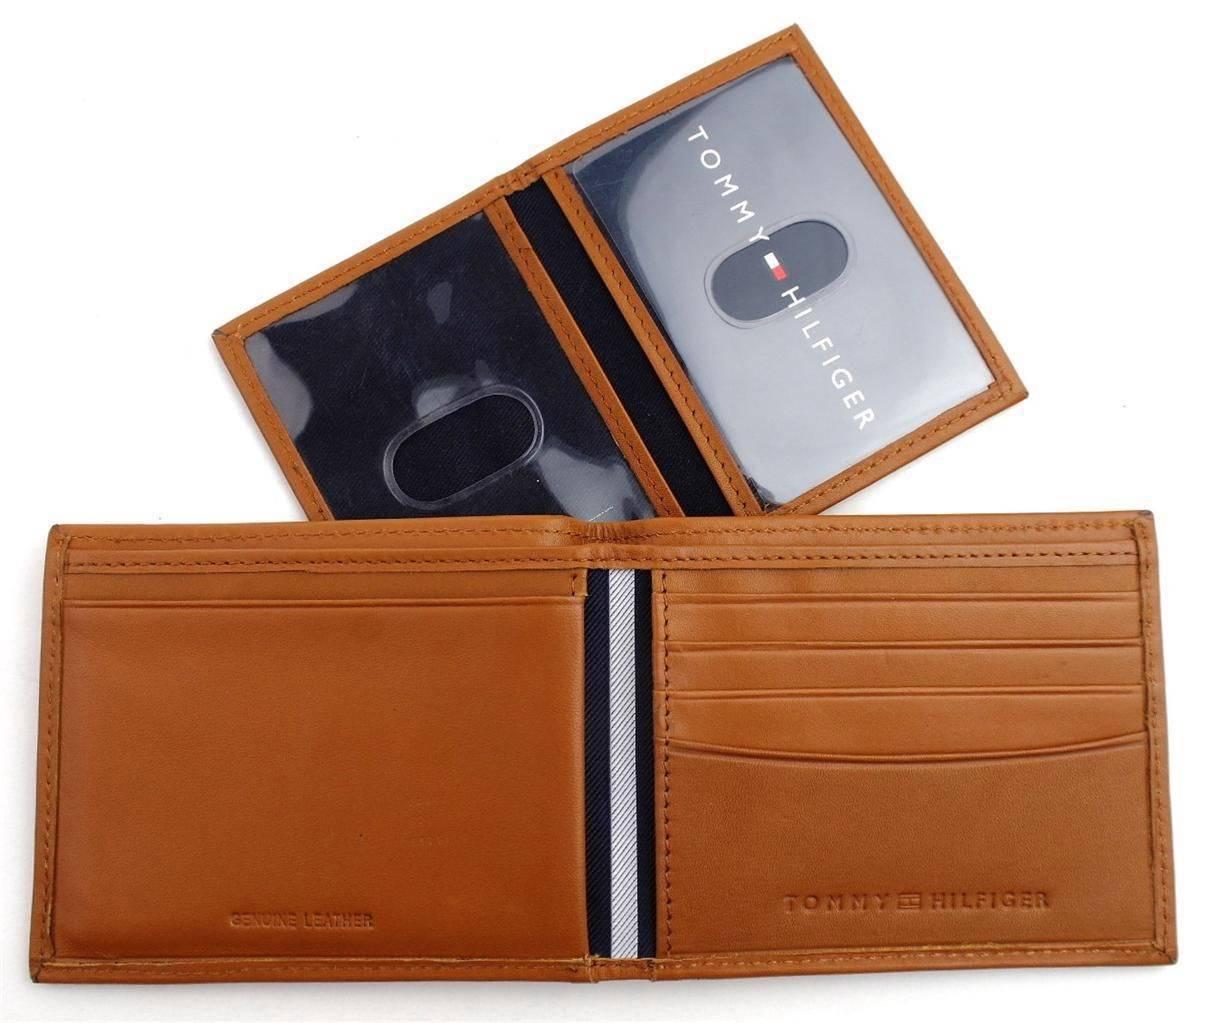 Tommy-Hilfiger-Men-039-s-Premium-Leather-Credit-Card-ID-Wallet-Passcase-31TL22X046 thumbnail 41